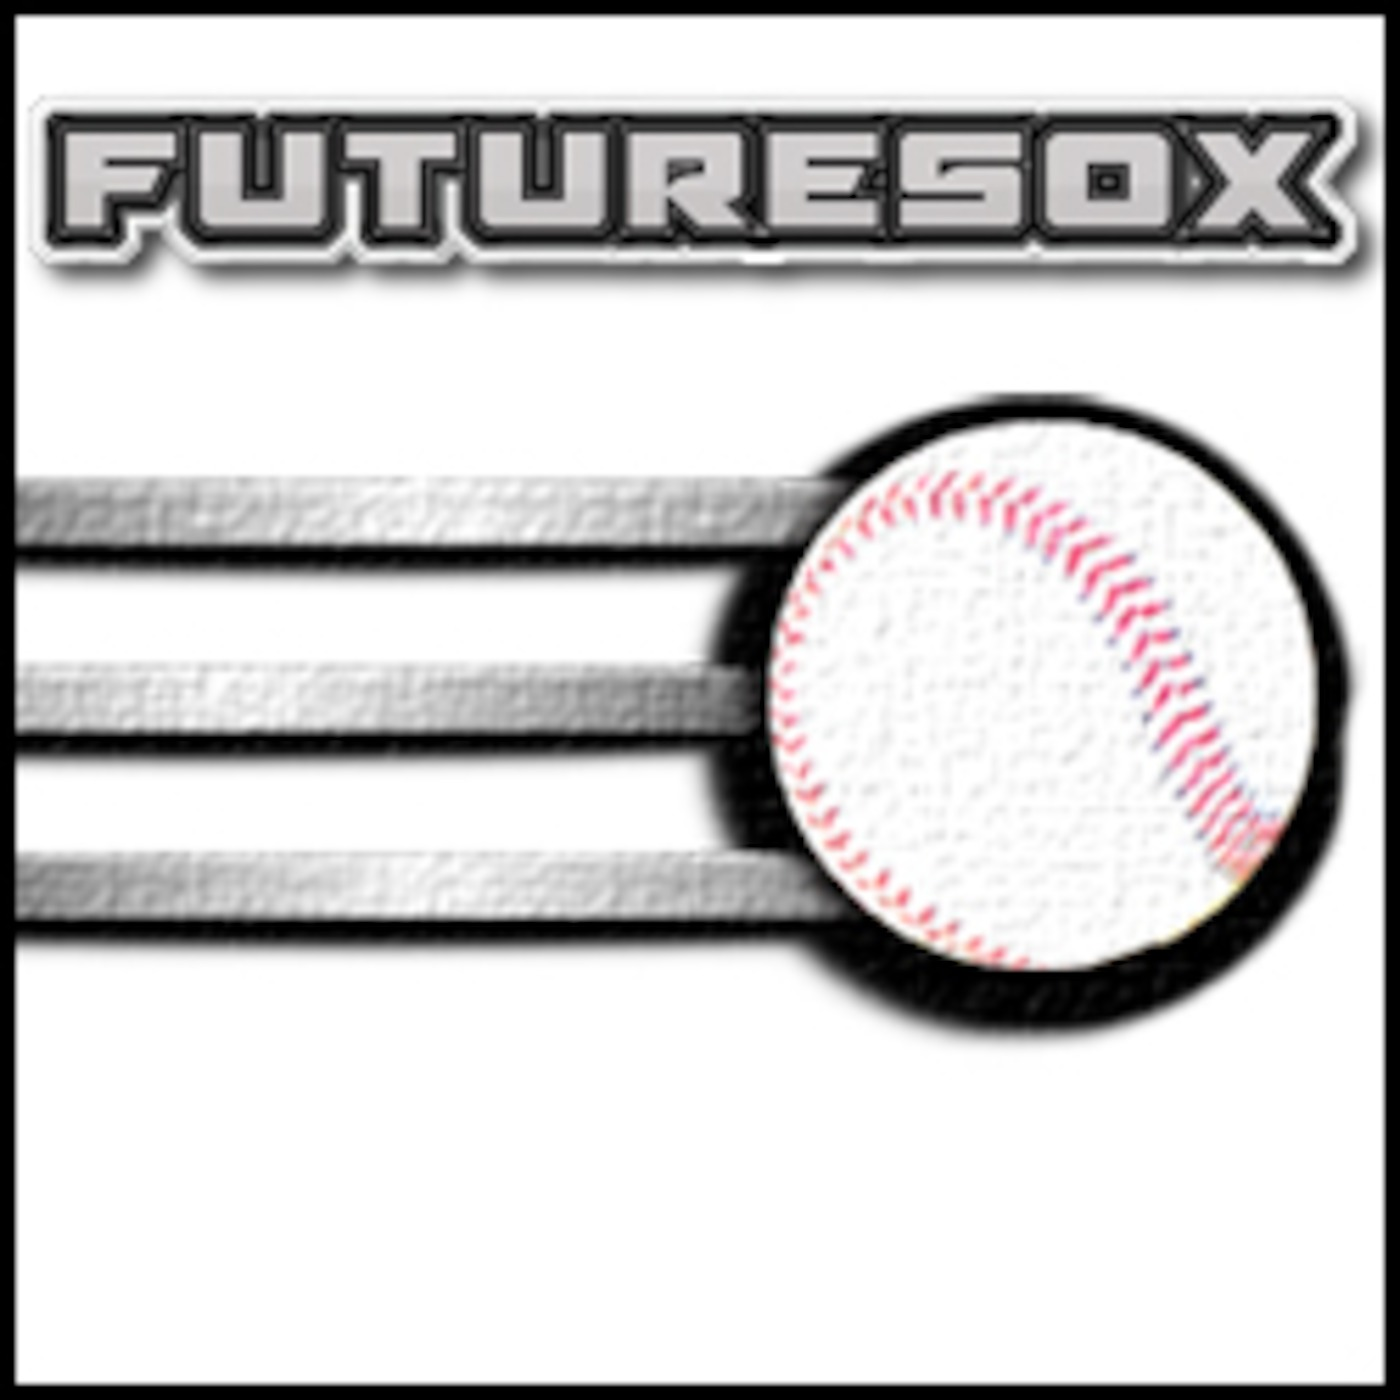 Future Sox logo